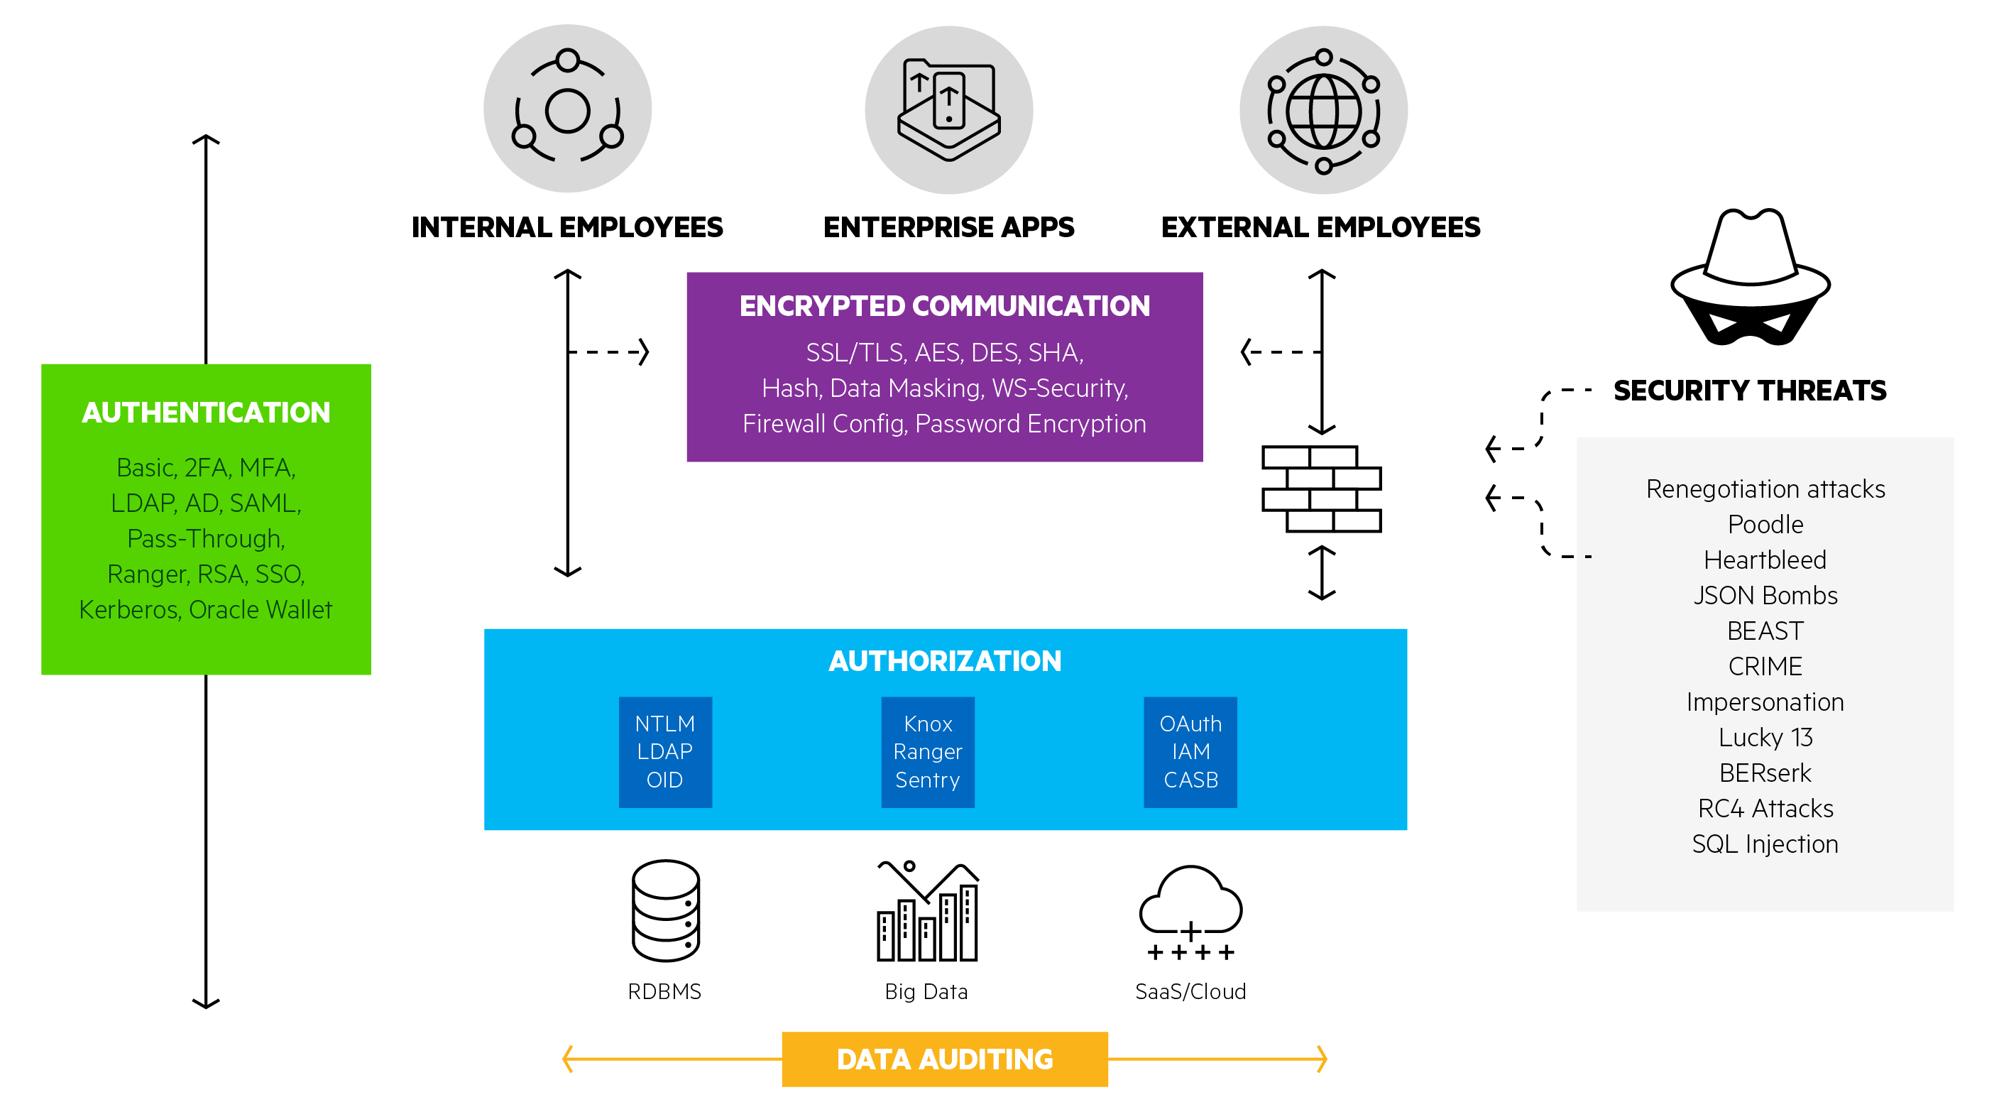 Data Security: Authentication, Authorization & Encryption